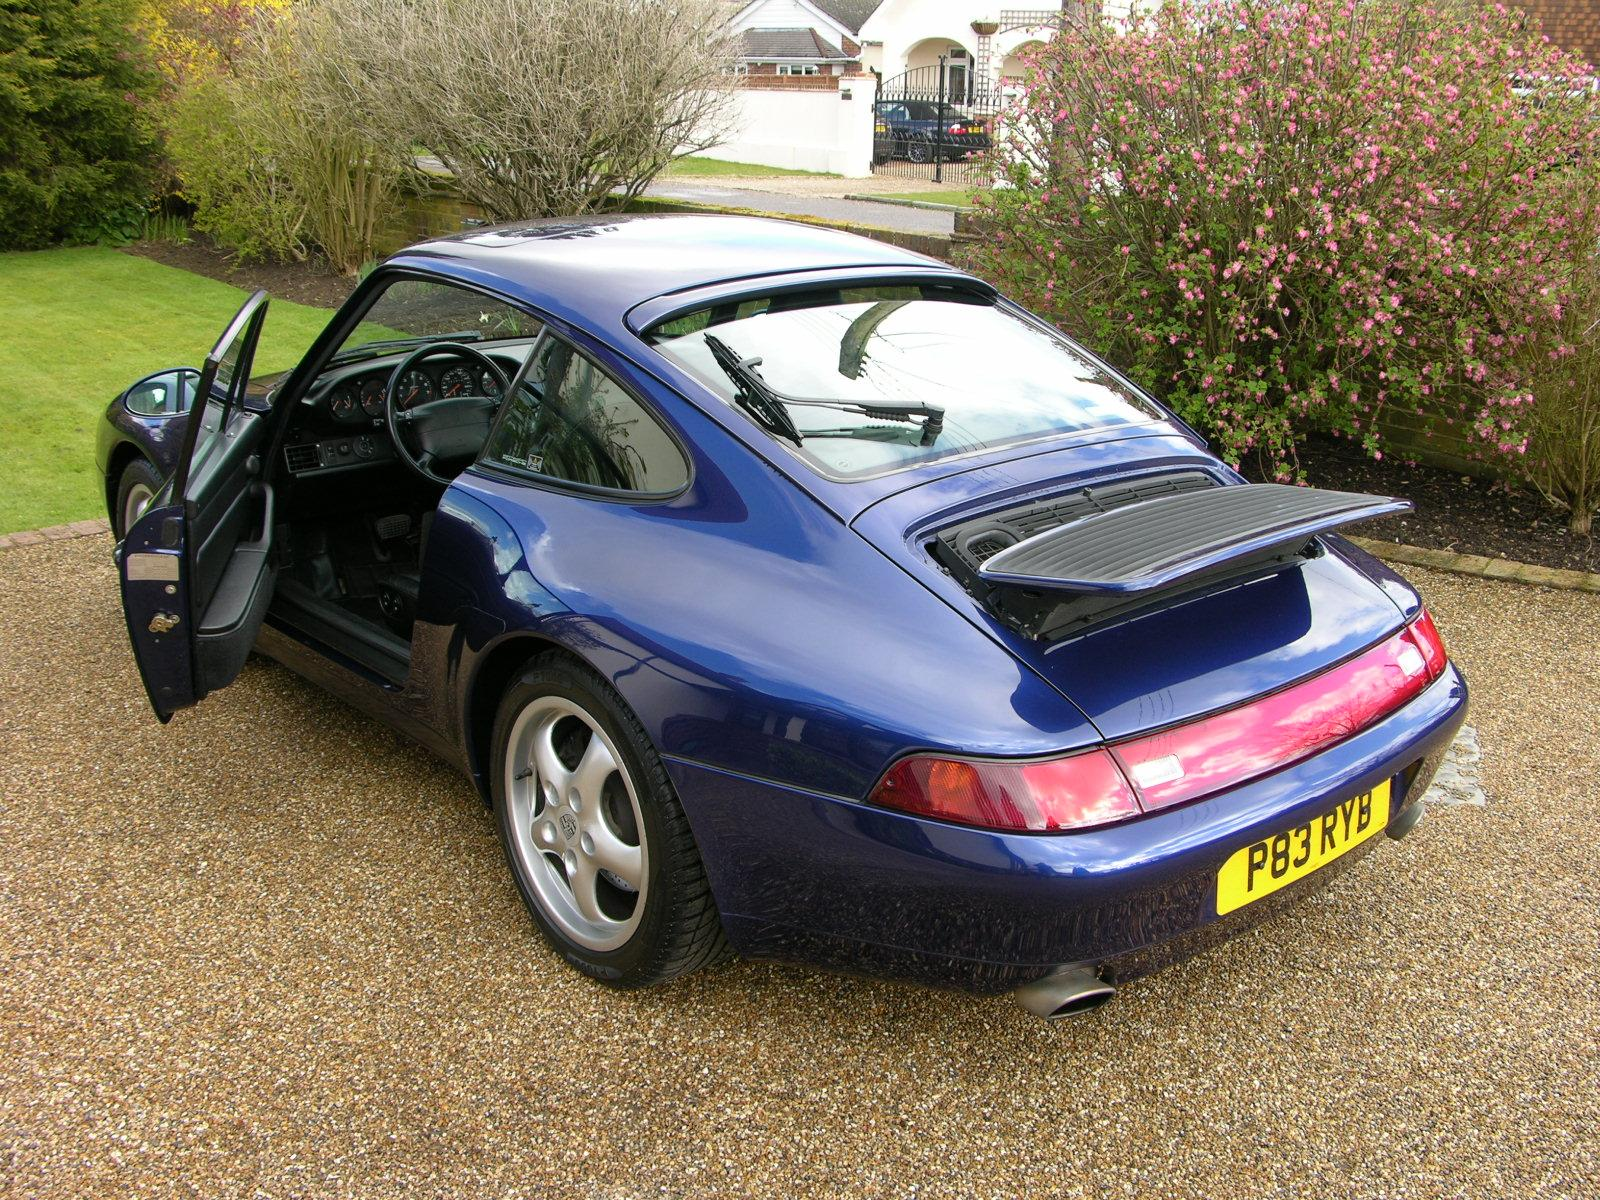 File Porsche 911 Carrera 2 Flickr The Car Spy 12 Jpg